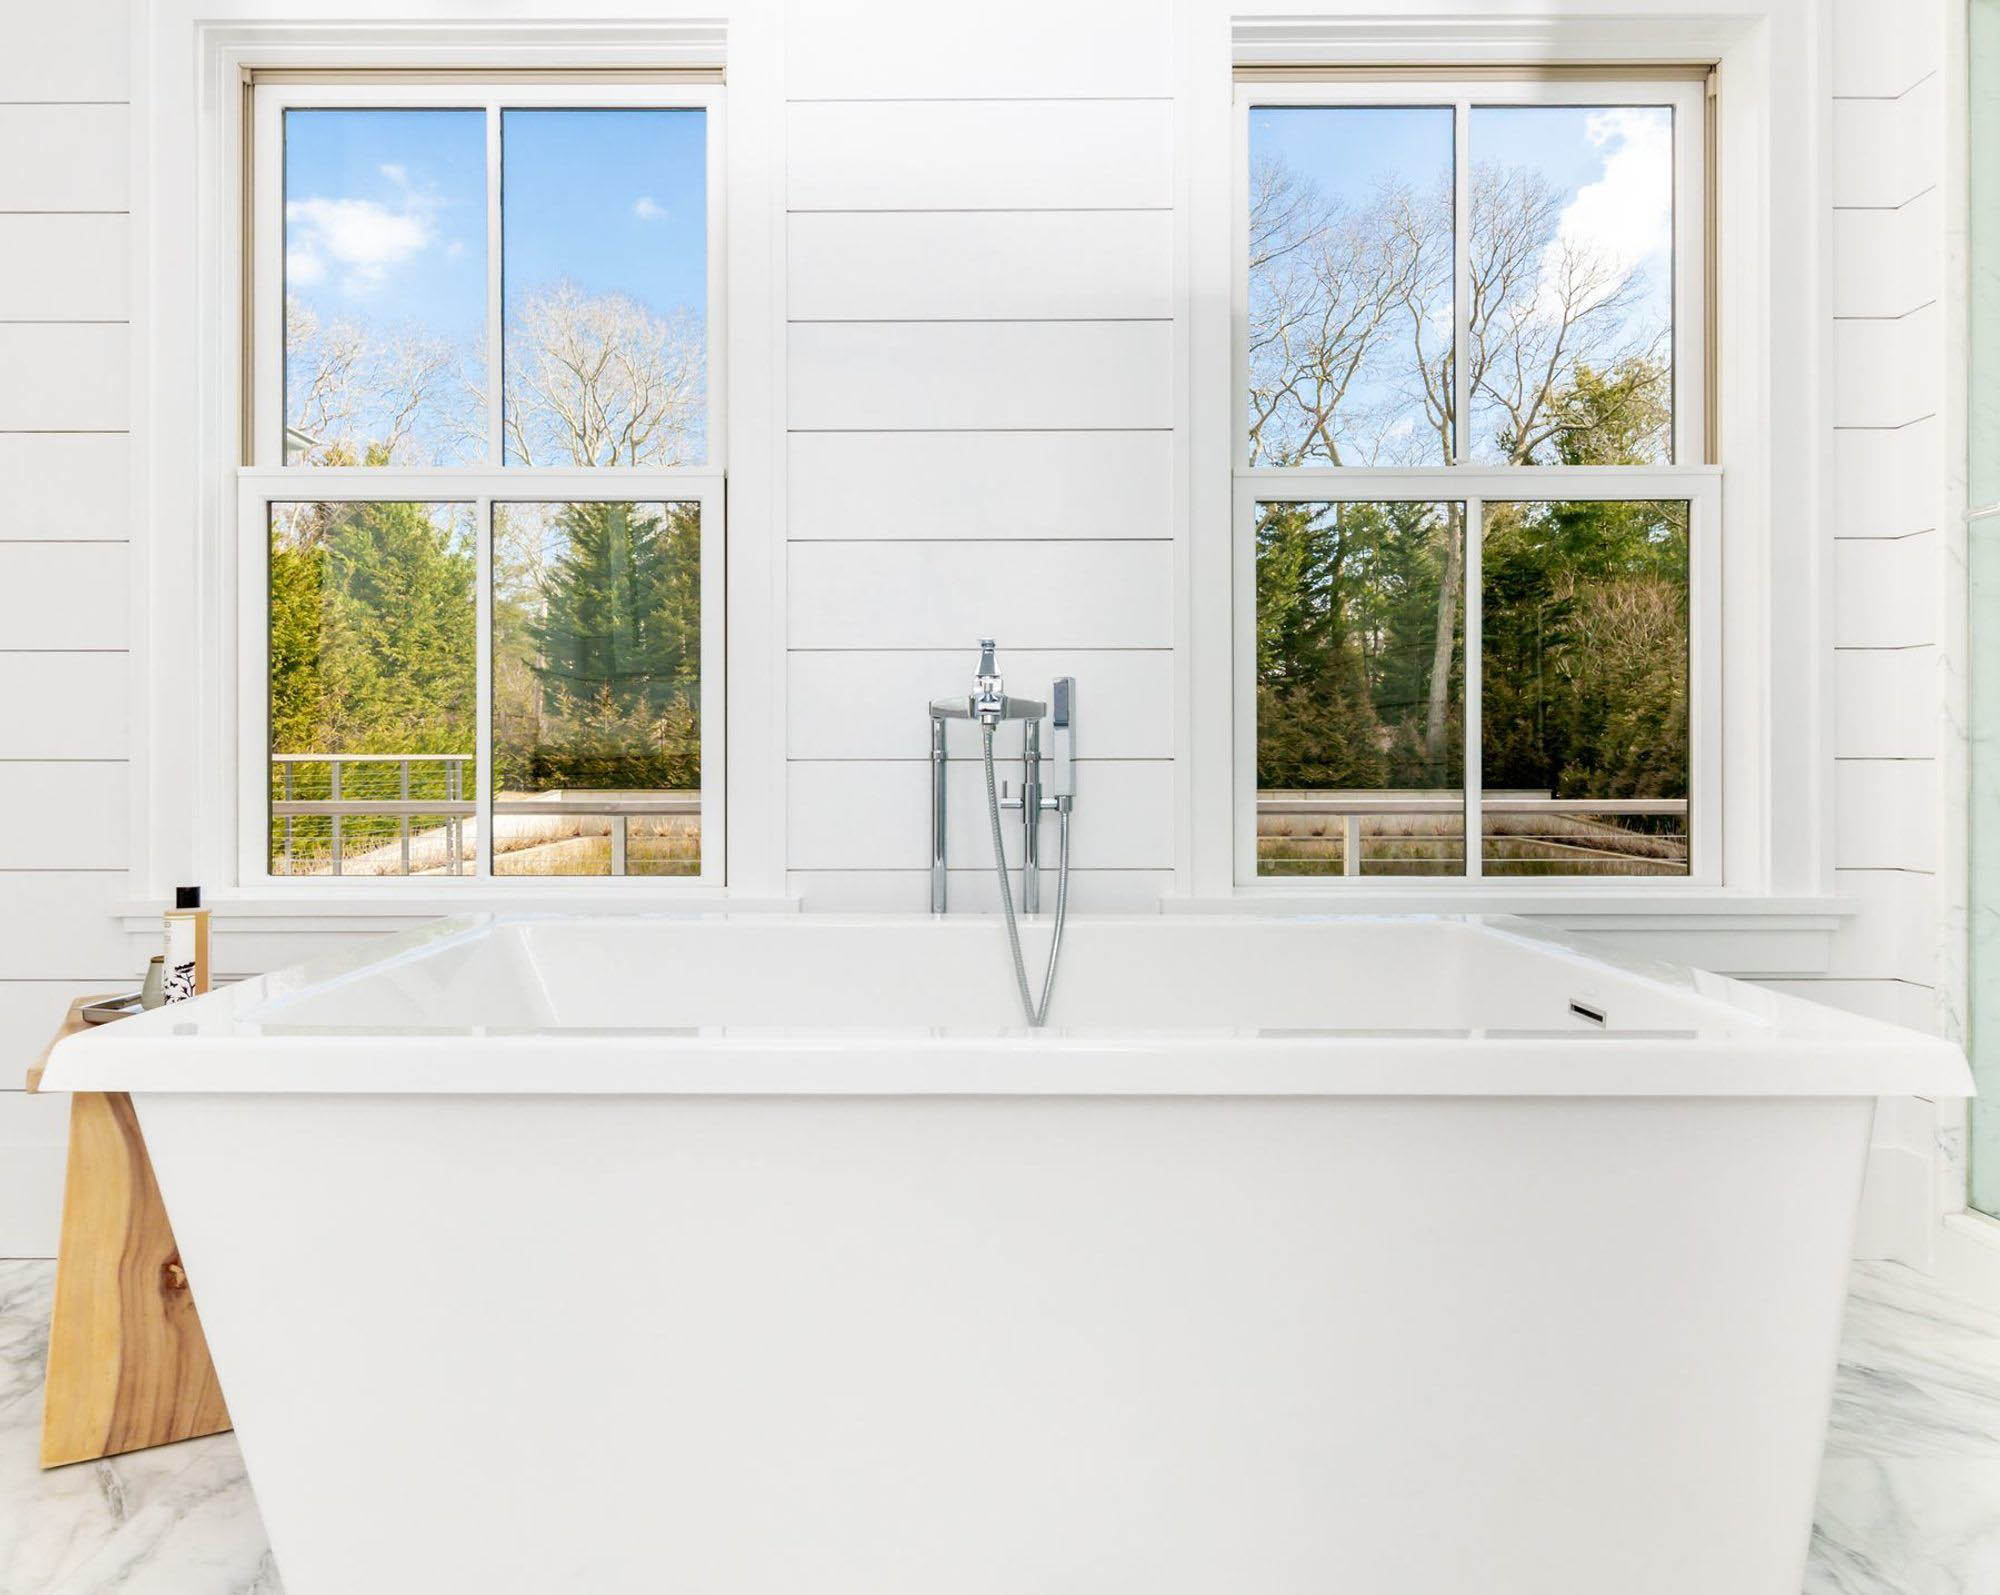 white bathroom shiplap wall trim white soaking freestanding tub marble floors white trim chrome faucet